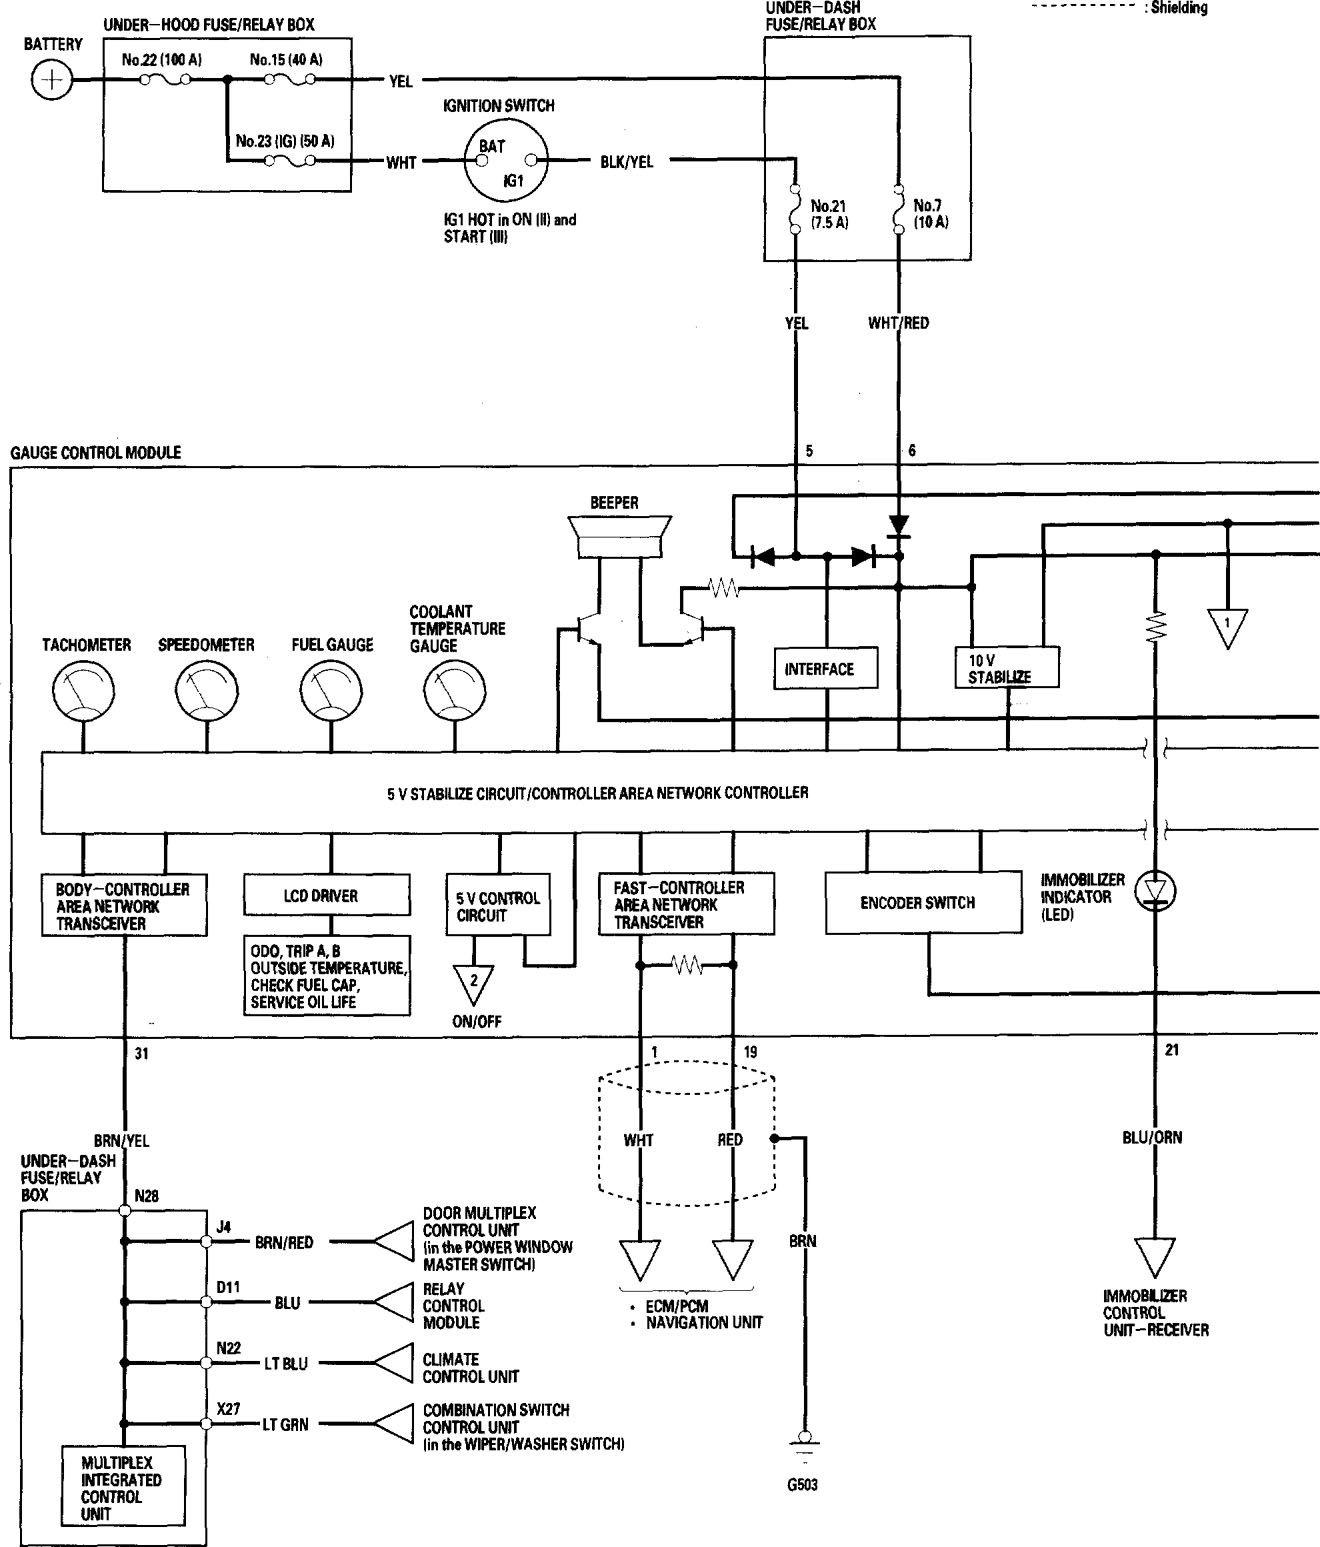 Honda Accord 2006 Wiring Diagrams Instrumentation Carknowledge Schematics Diagram Part 1